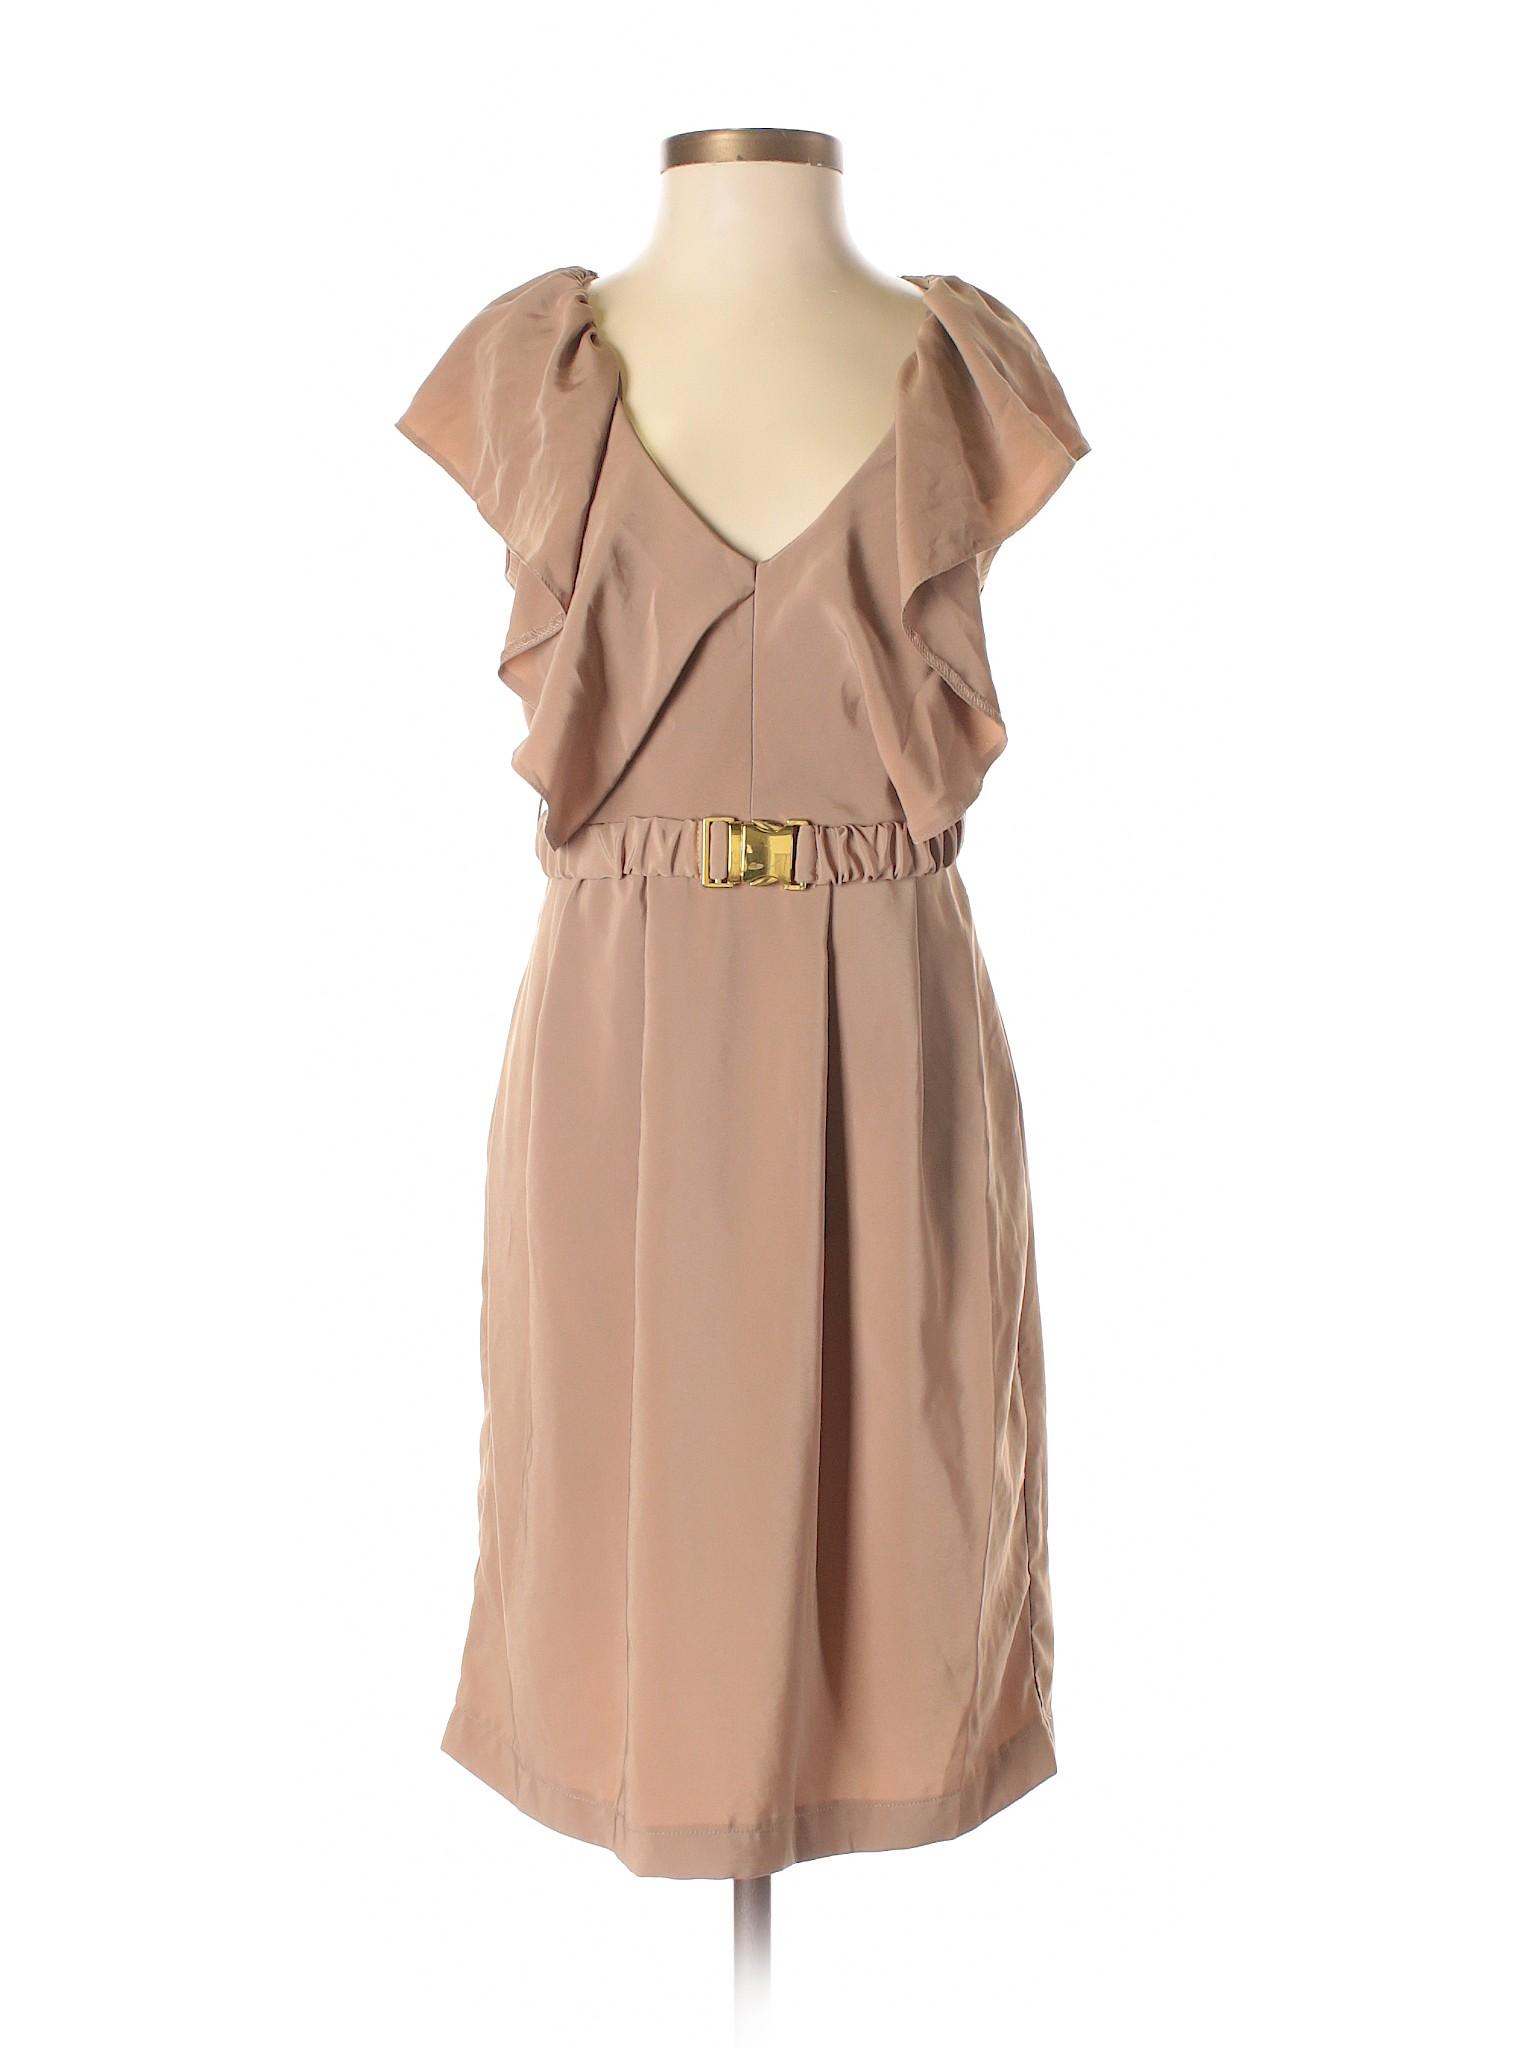 Casual Dress H amp;M Casual amp;M Dress Selling H amp;M Selling H Selling vR46xqw